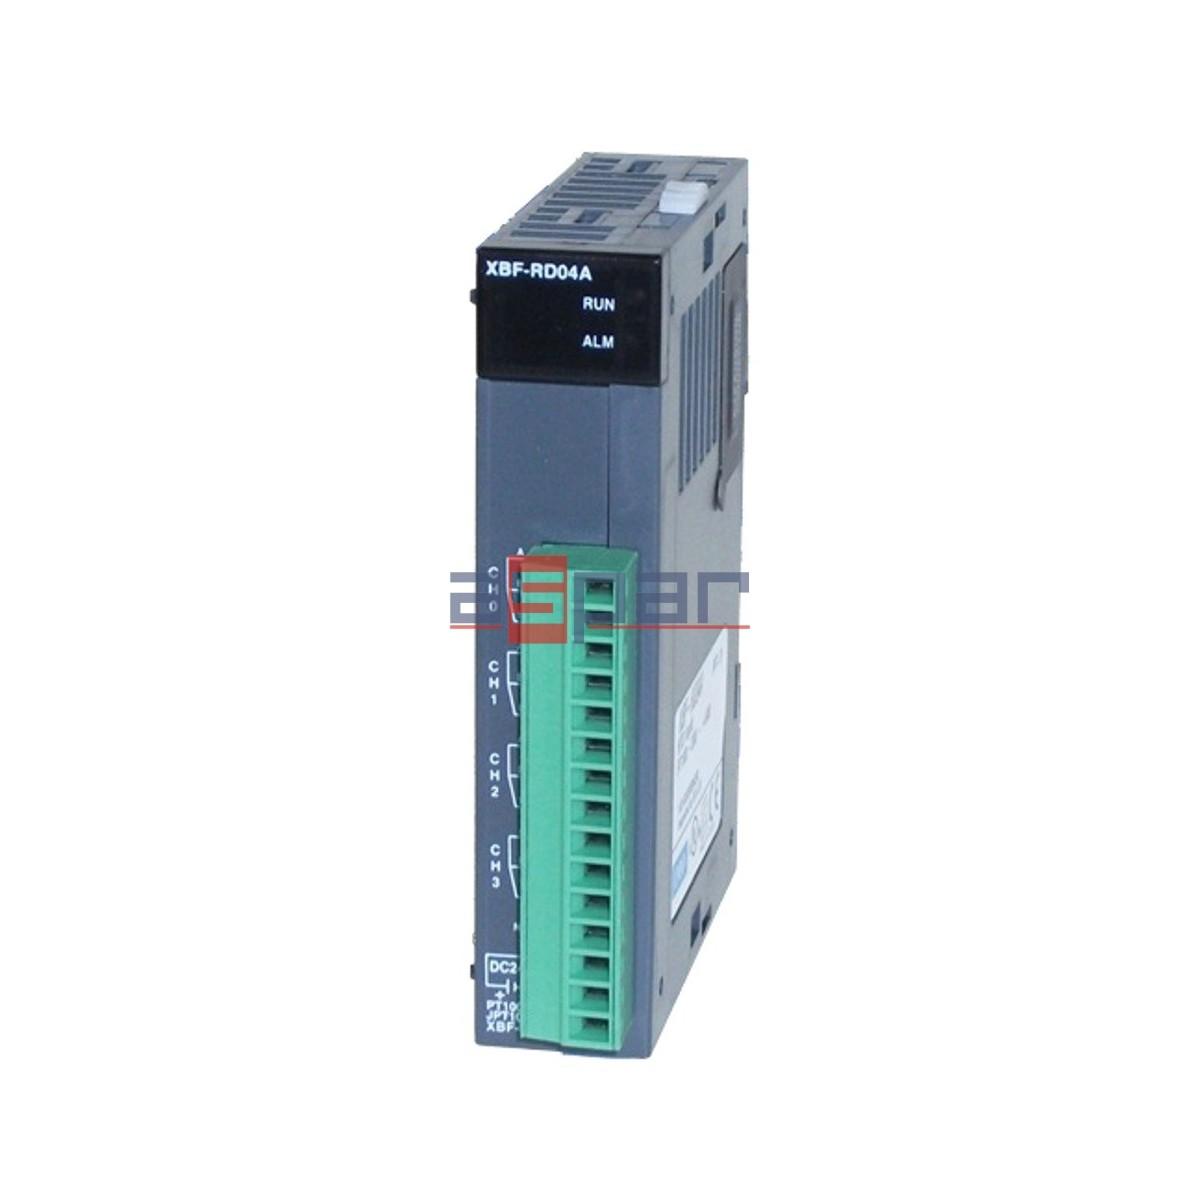 XBF-RD04A - 4 wejścia PT100